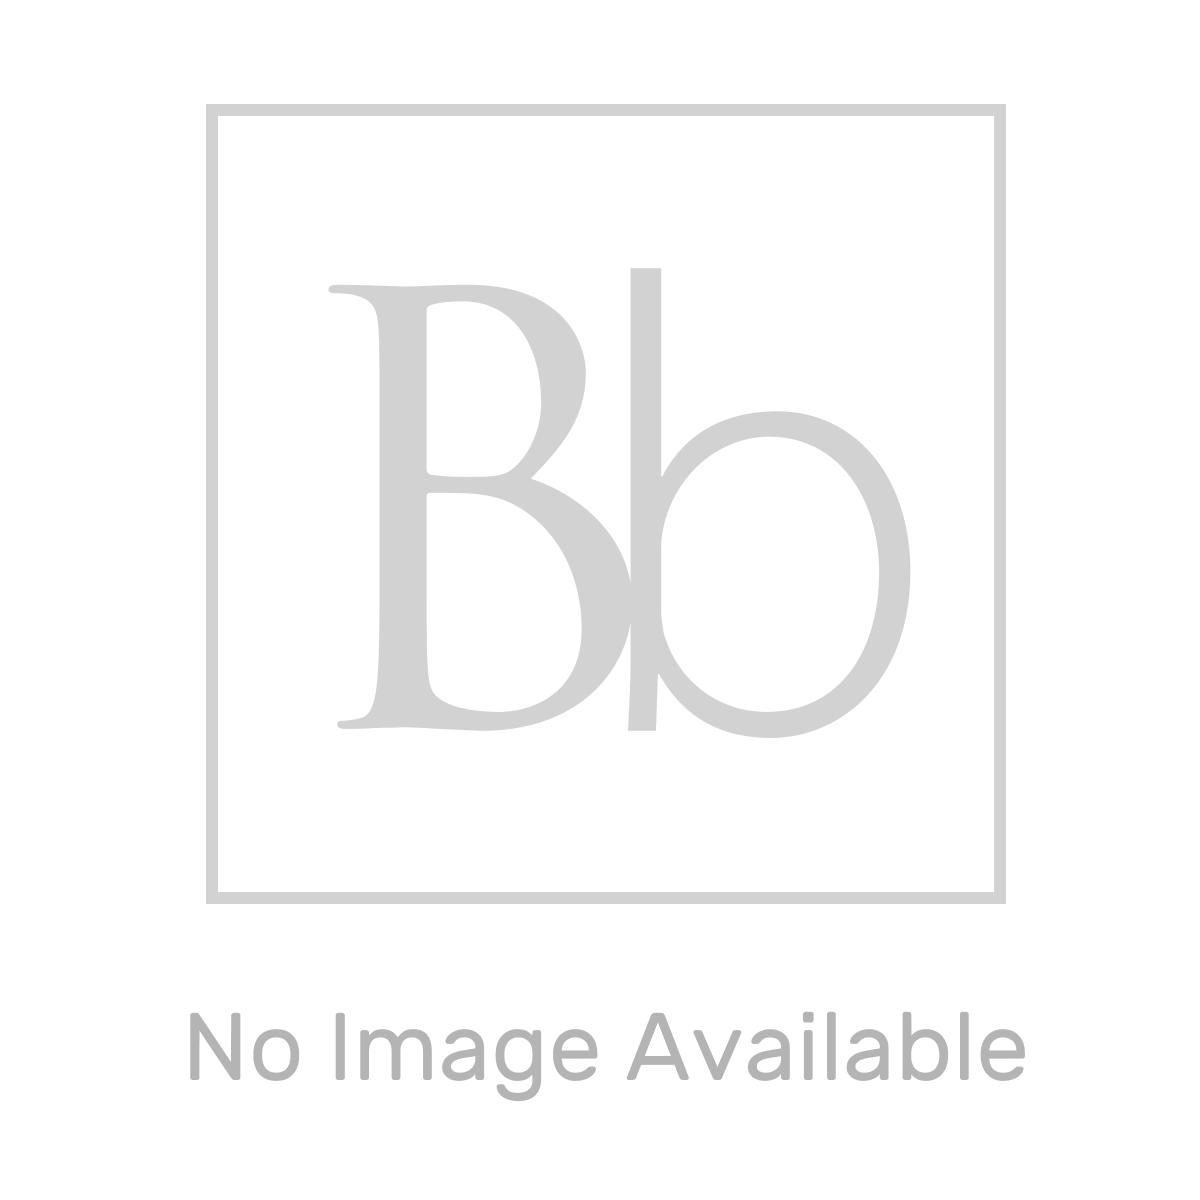 Jersey White Double Door Bathroom Mirrored Cabinet Fixing Instructions